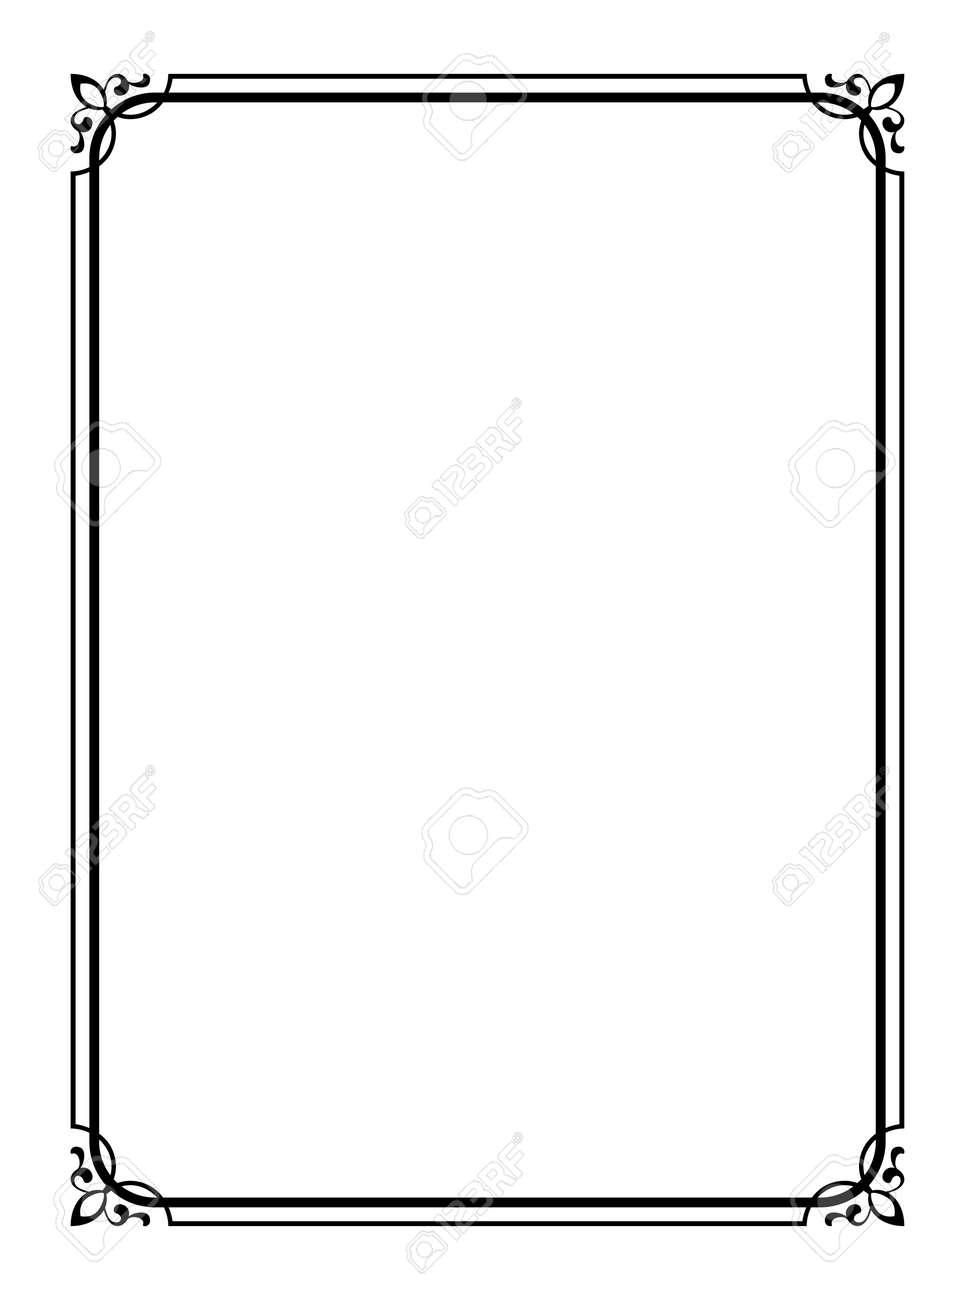 Vector simple black calligraph ornamental decorative frame pattern - 26605680